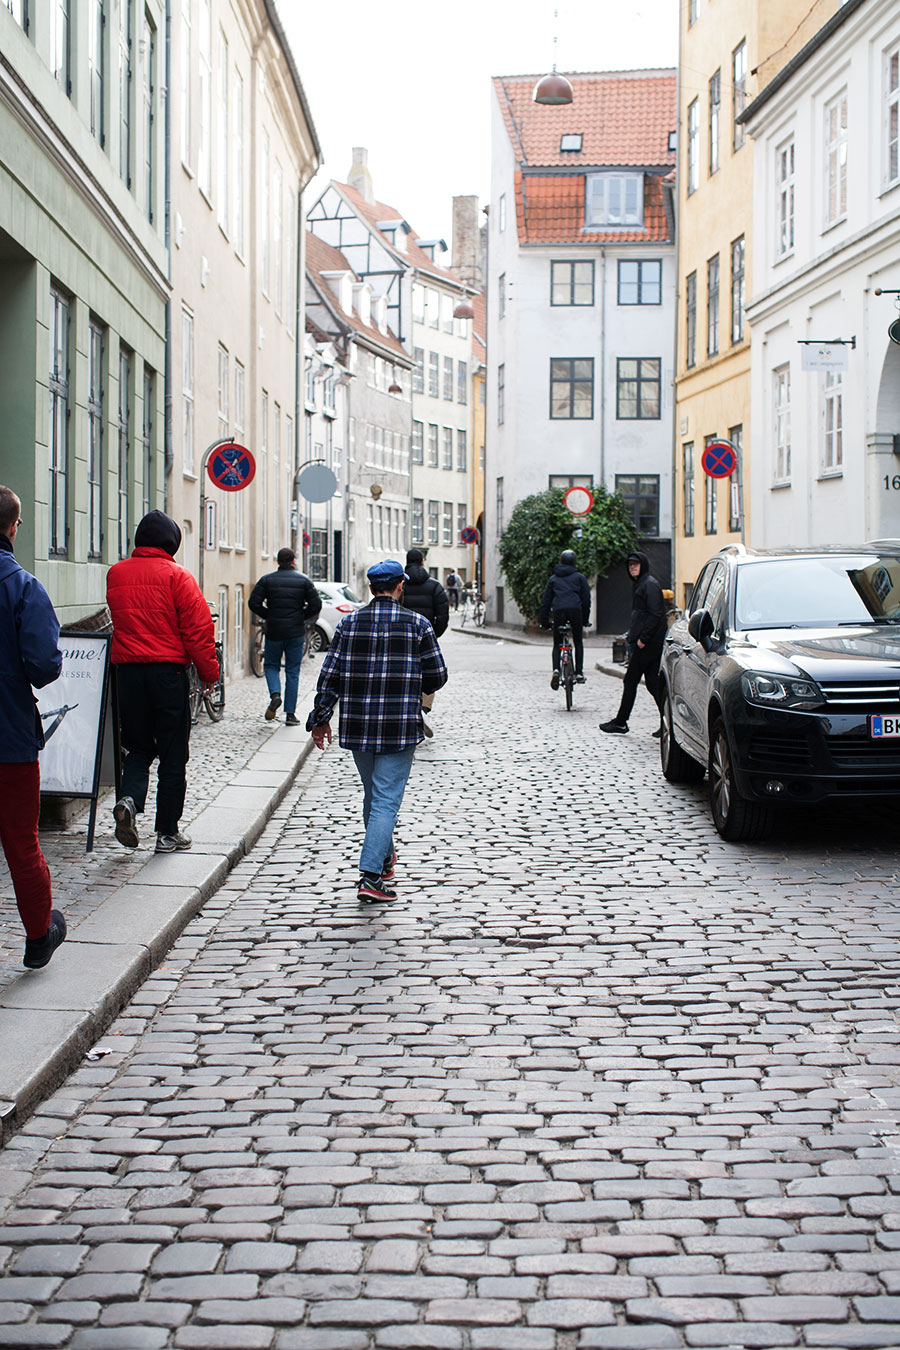 danskebåten oslo københavn priser